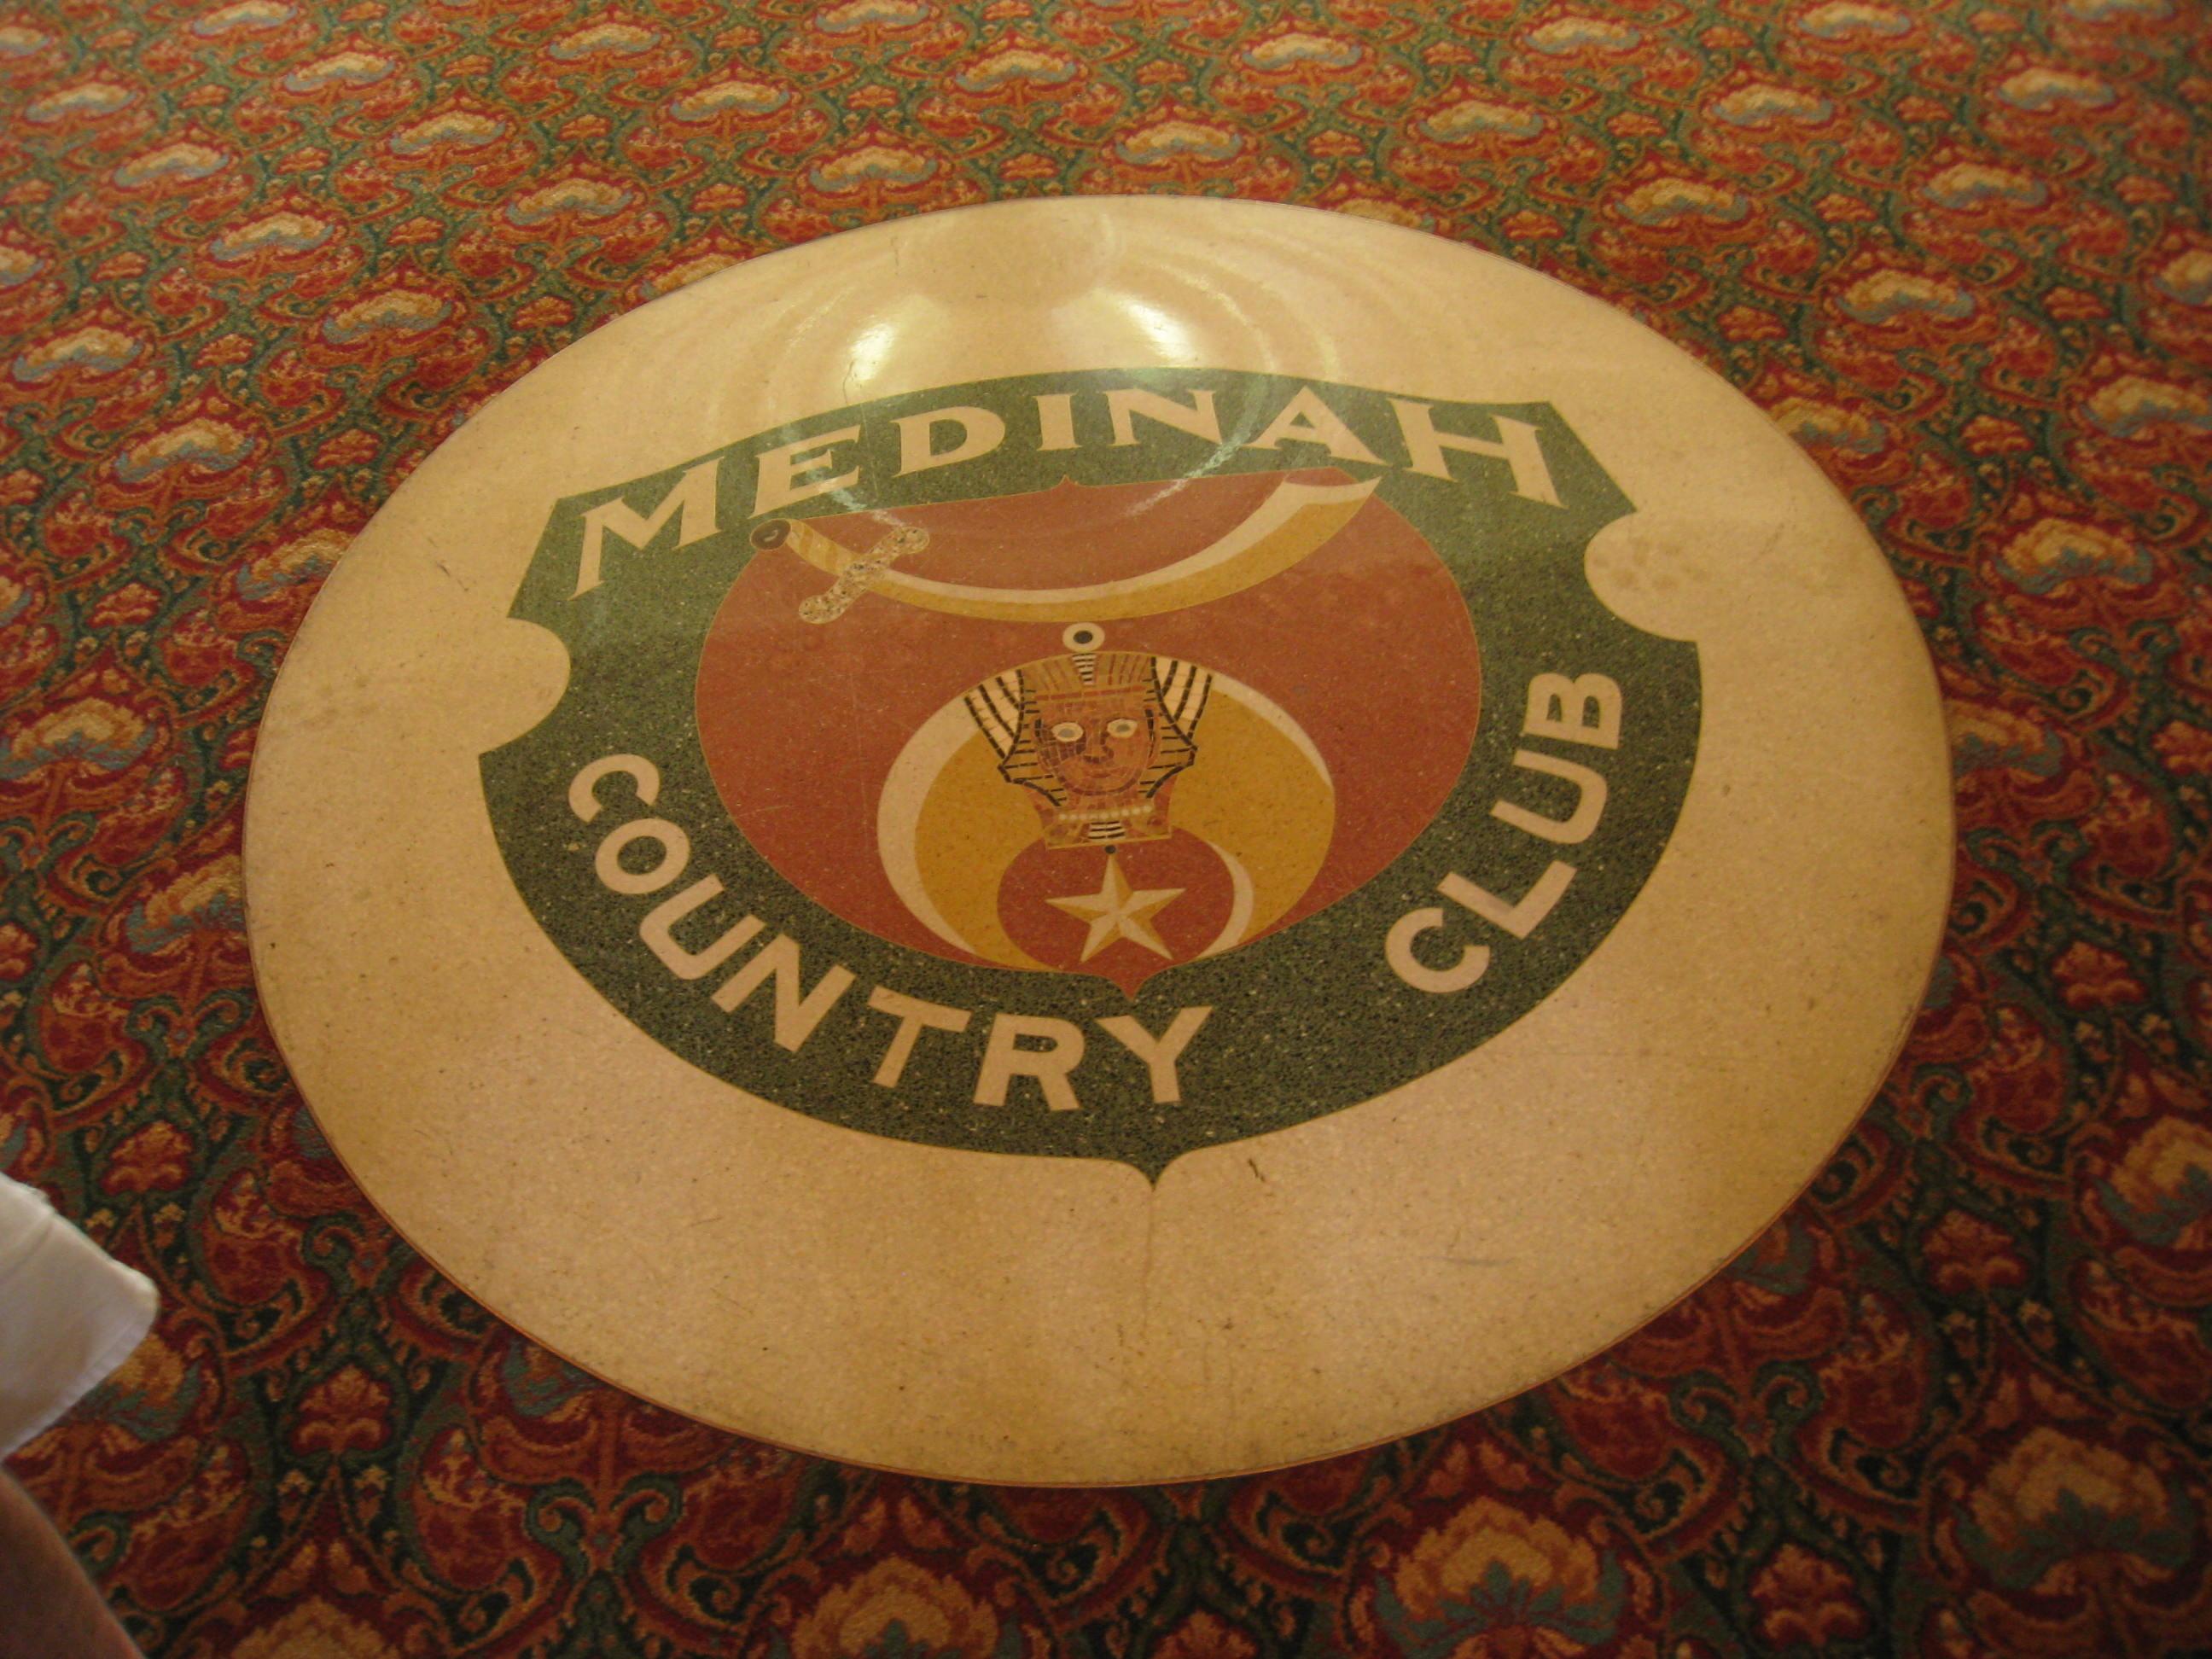 file medinah country club medinah illinois logo jpg wikimedia